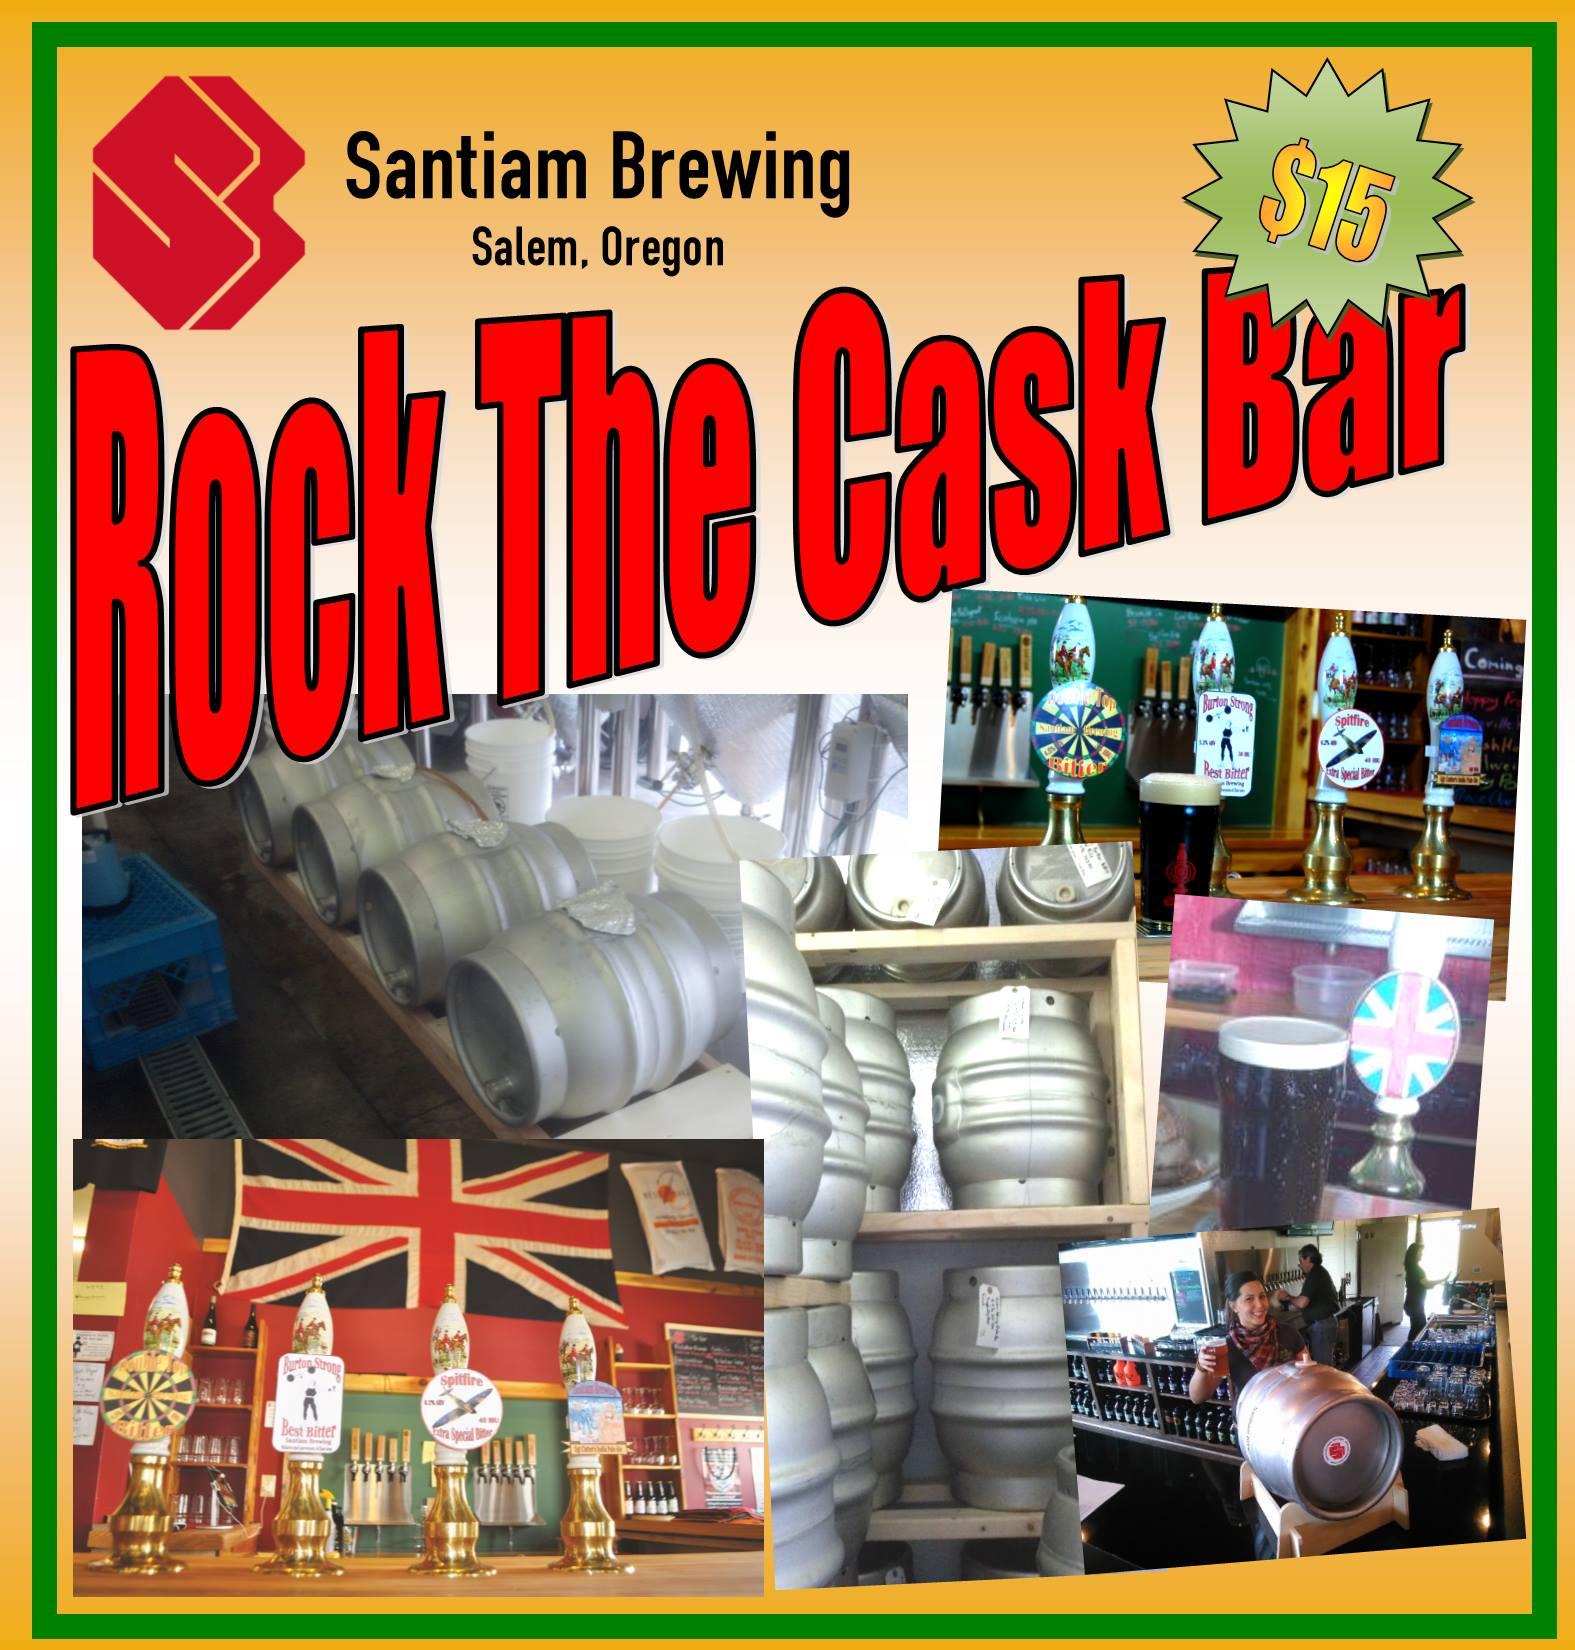 Santiam Brewing Rock The Cask Bar 2016